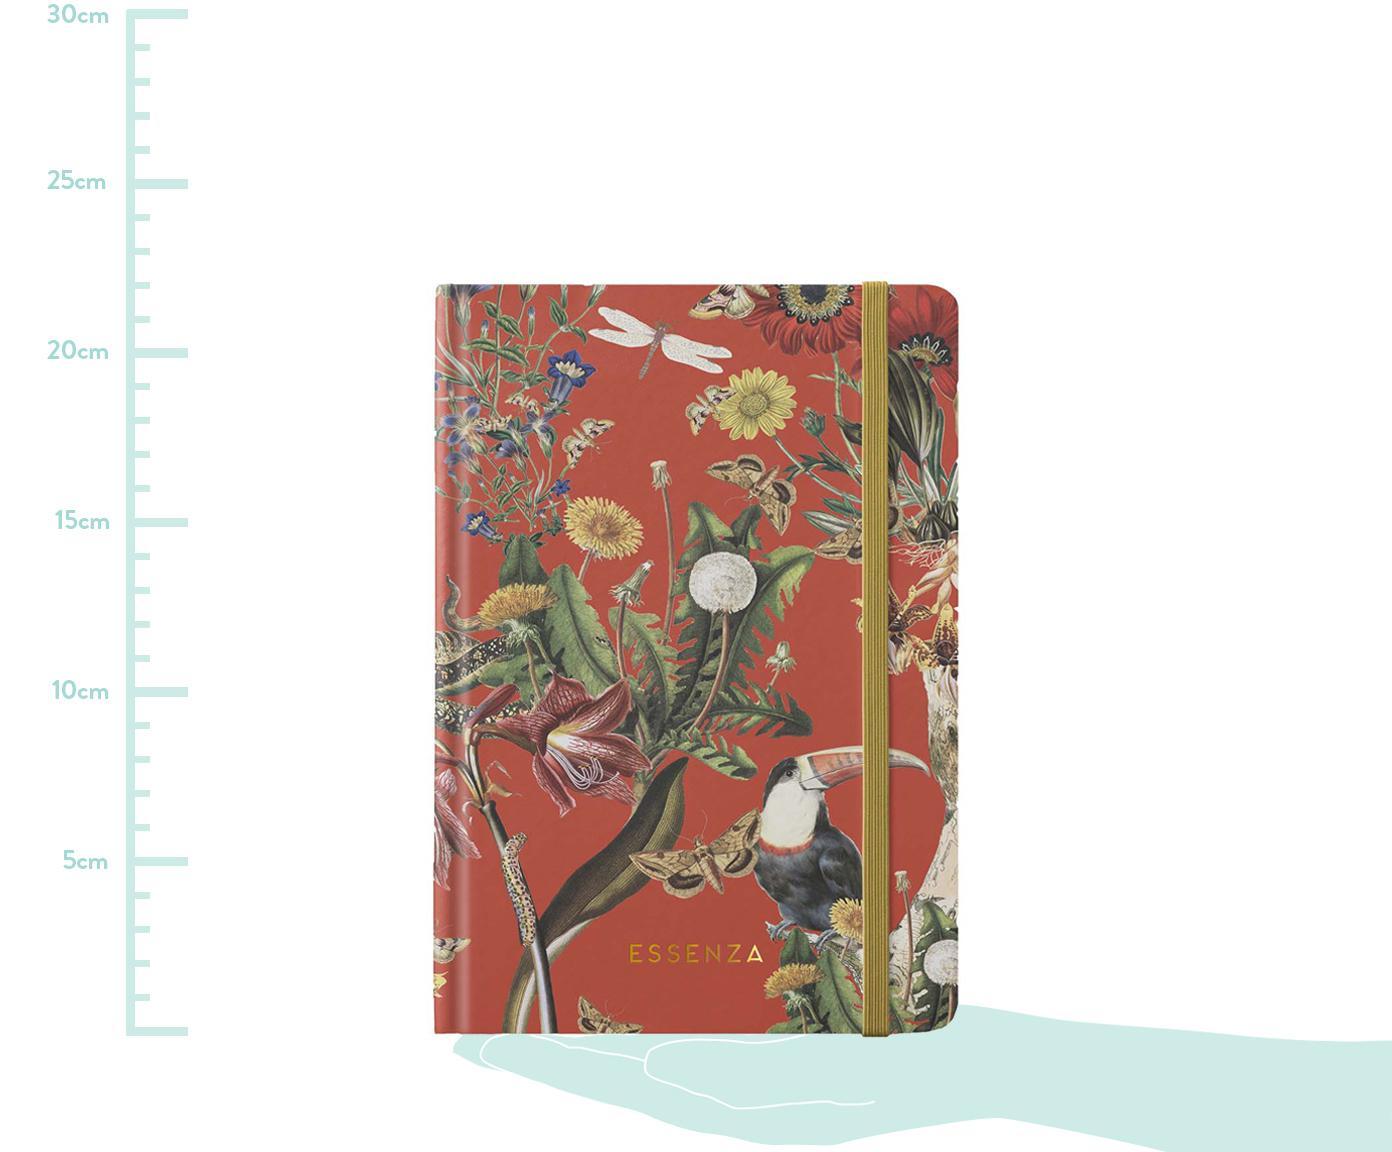 Notizbuch Airen, Papier, Chilirot, Mehrfarbig, 15 x 22 cm